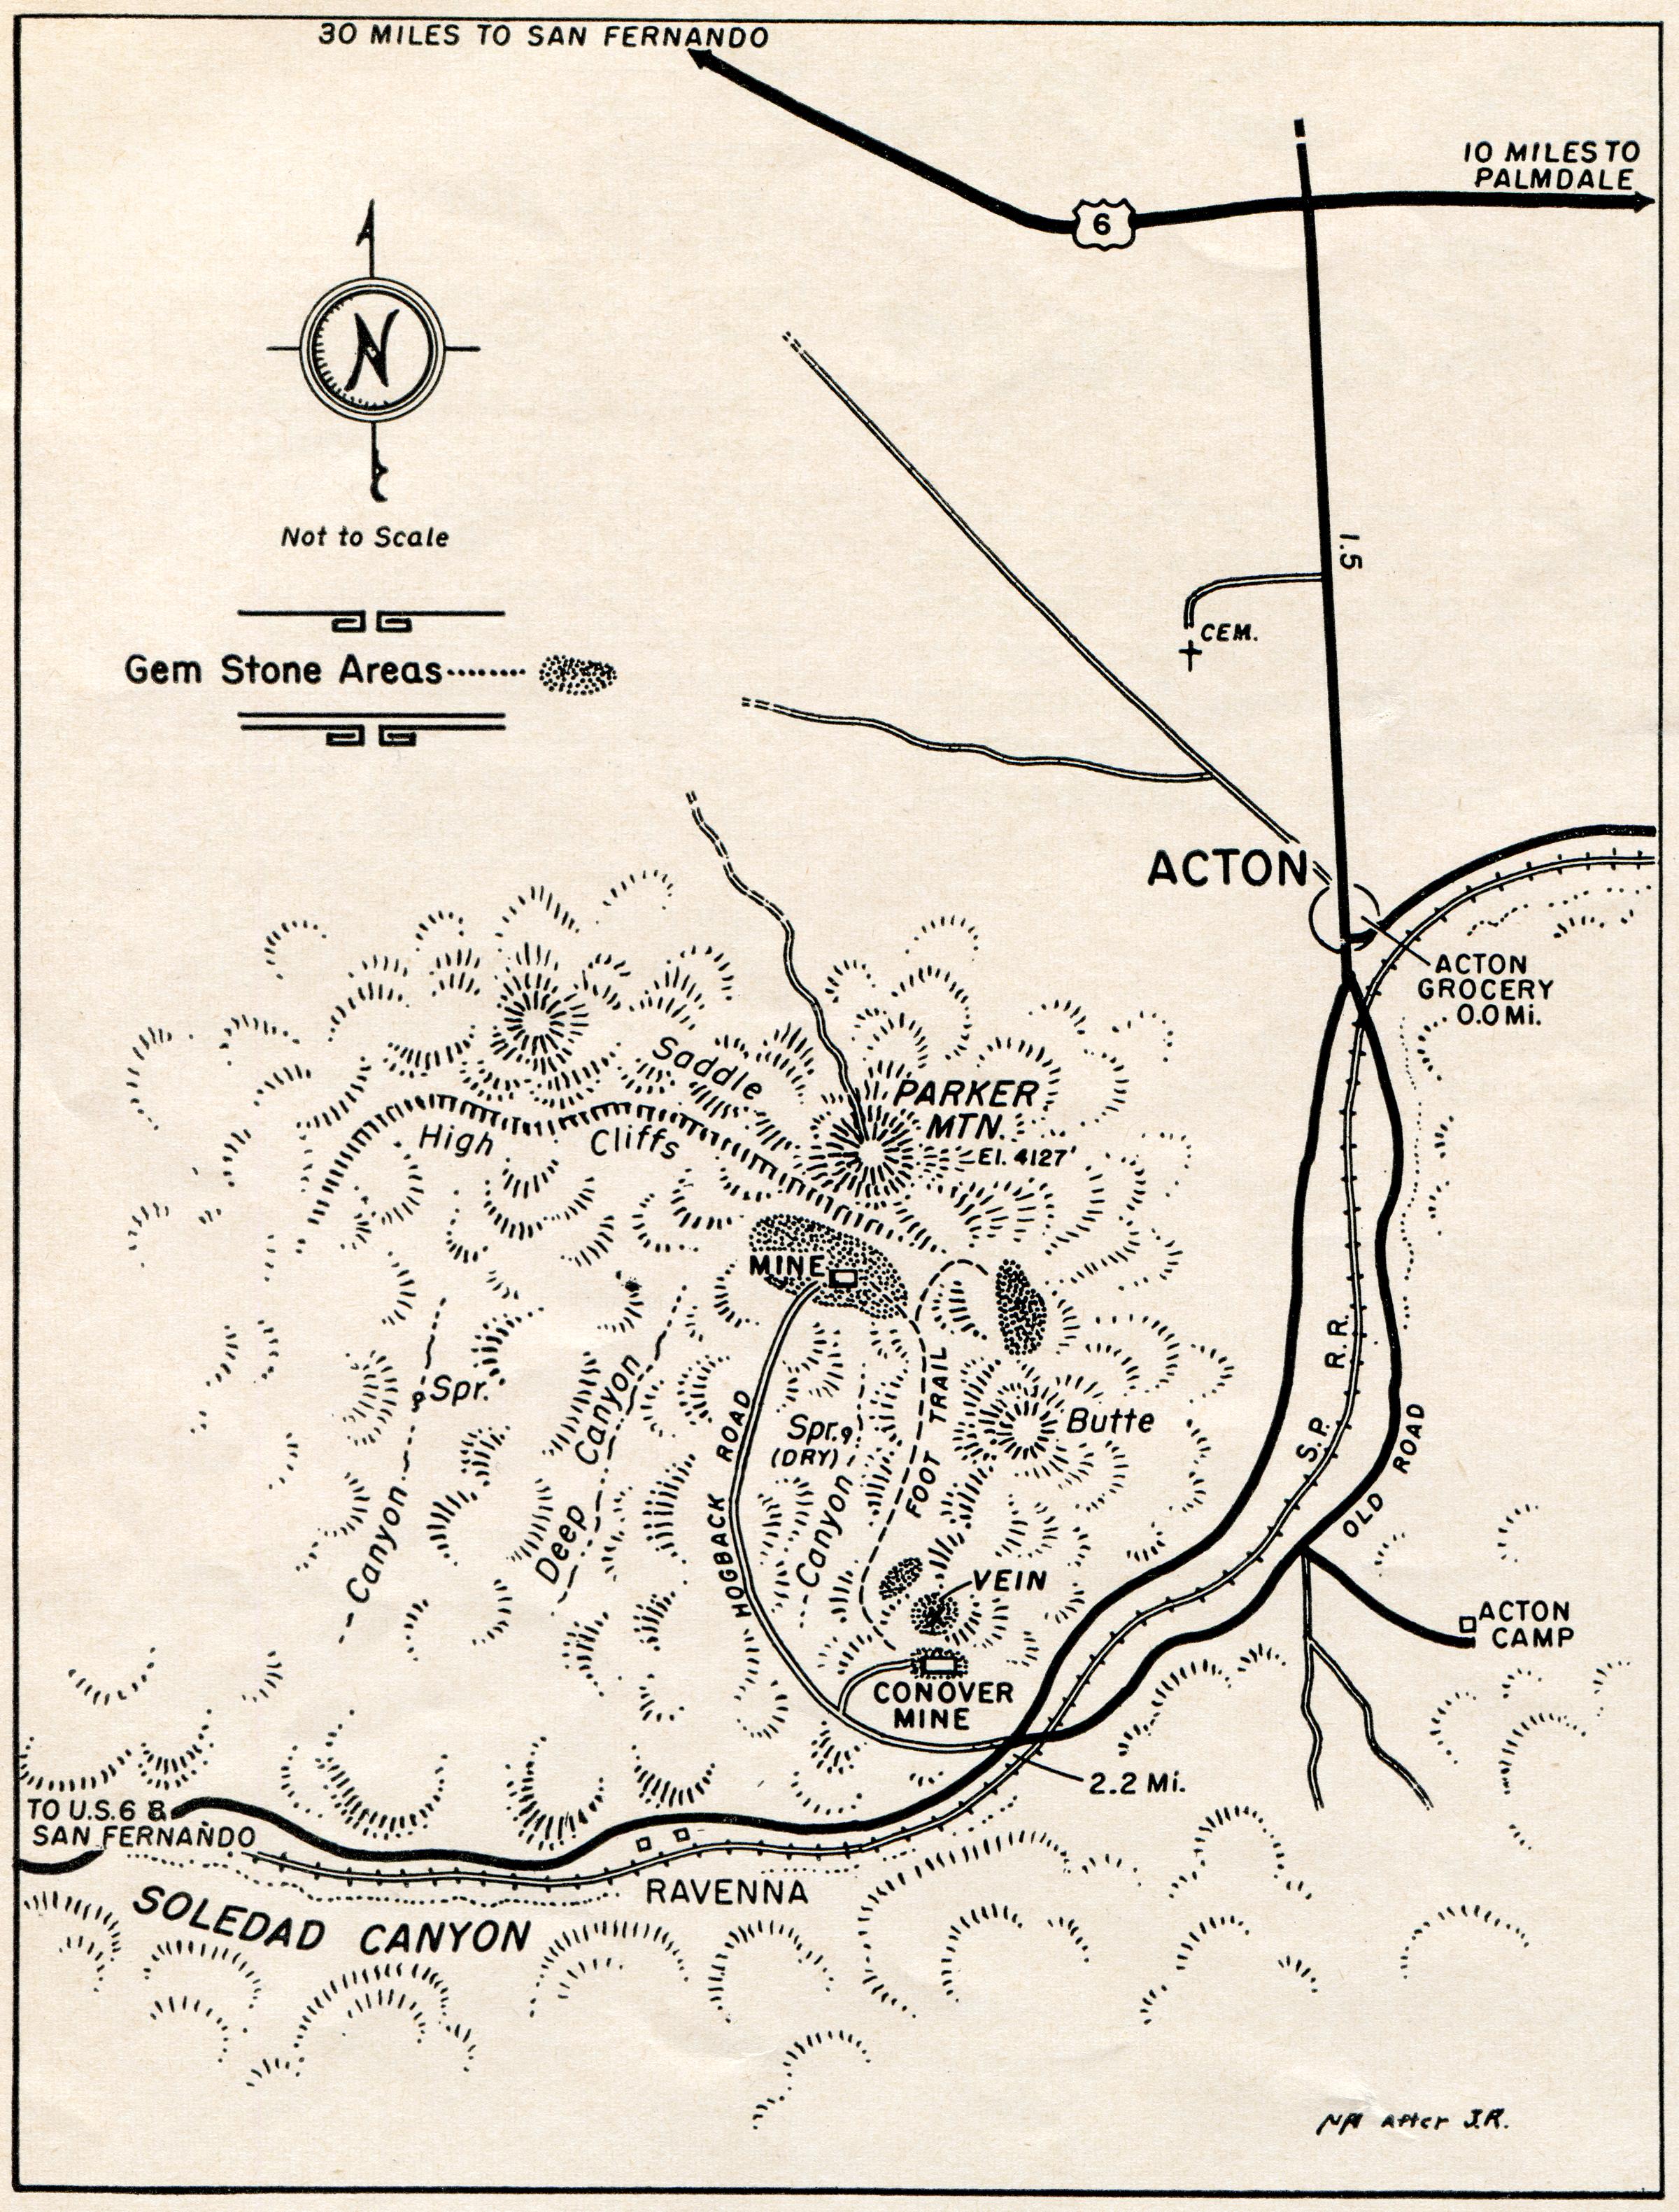 Rockhounding California Map.Scvhistory Com Ap2904 Ravenna Map Rockhounding At Ravenna 1957